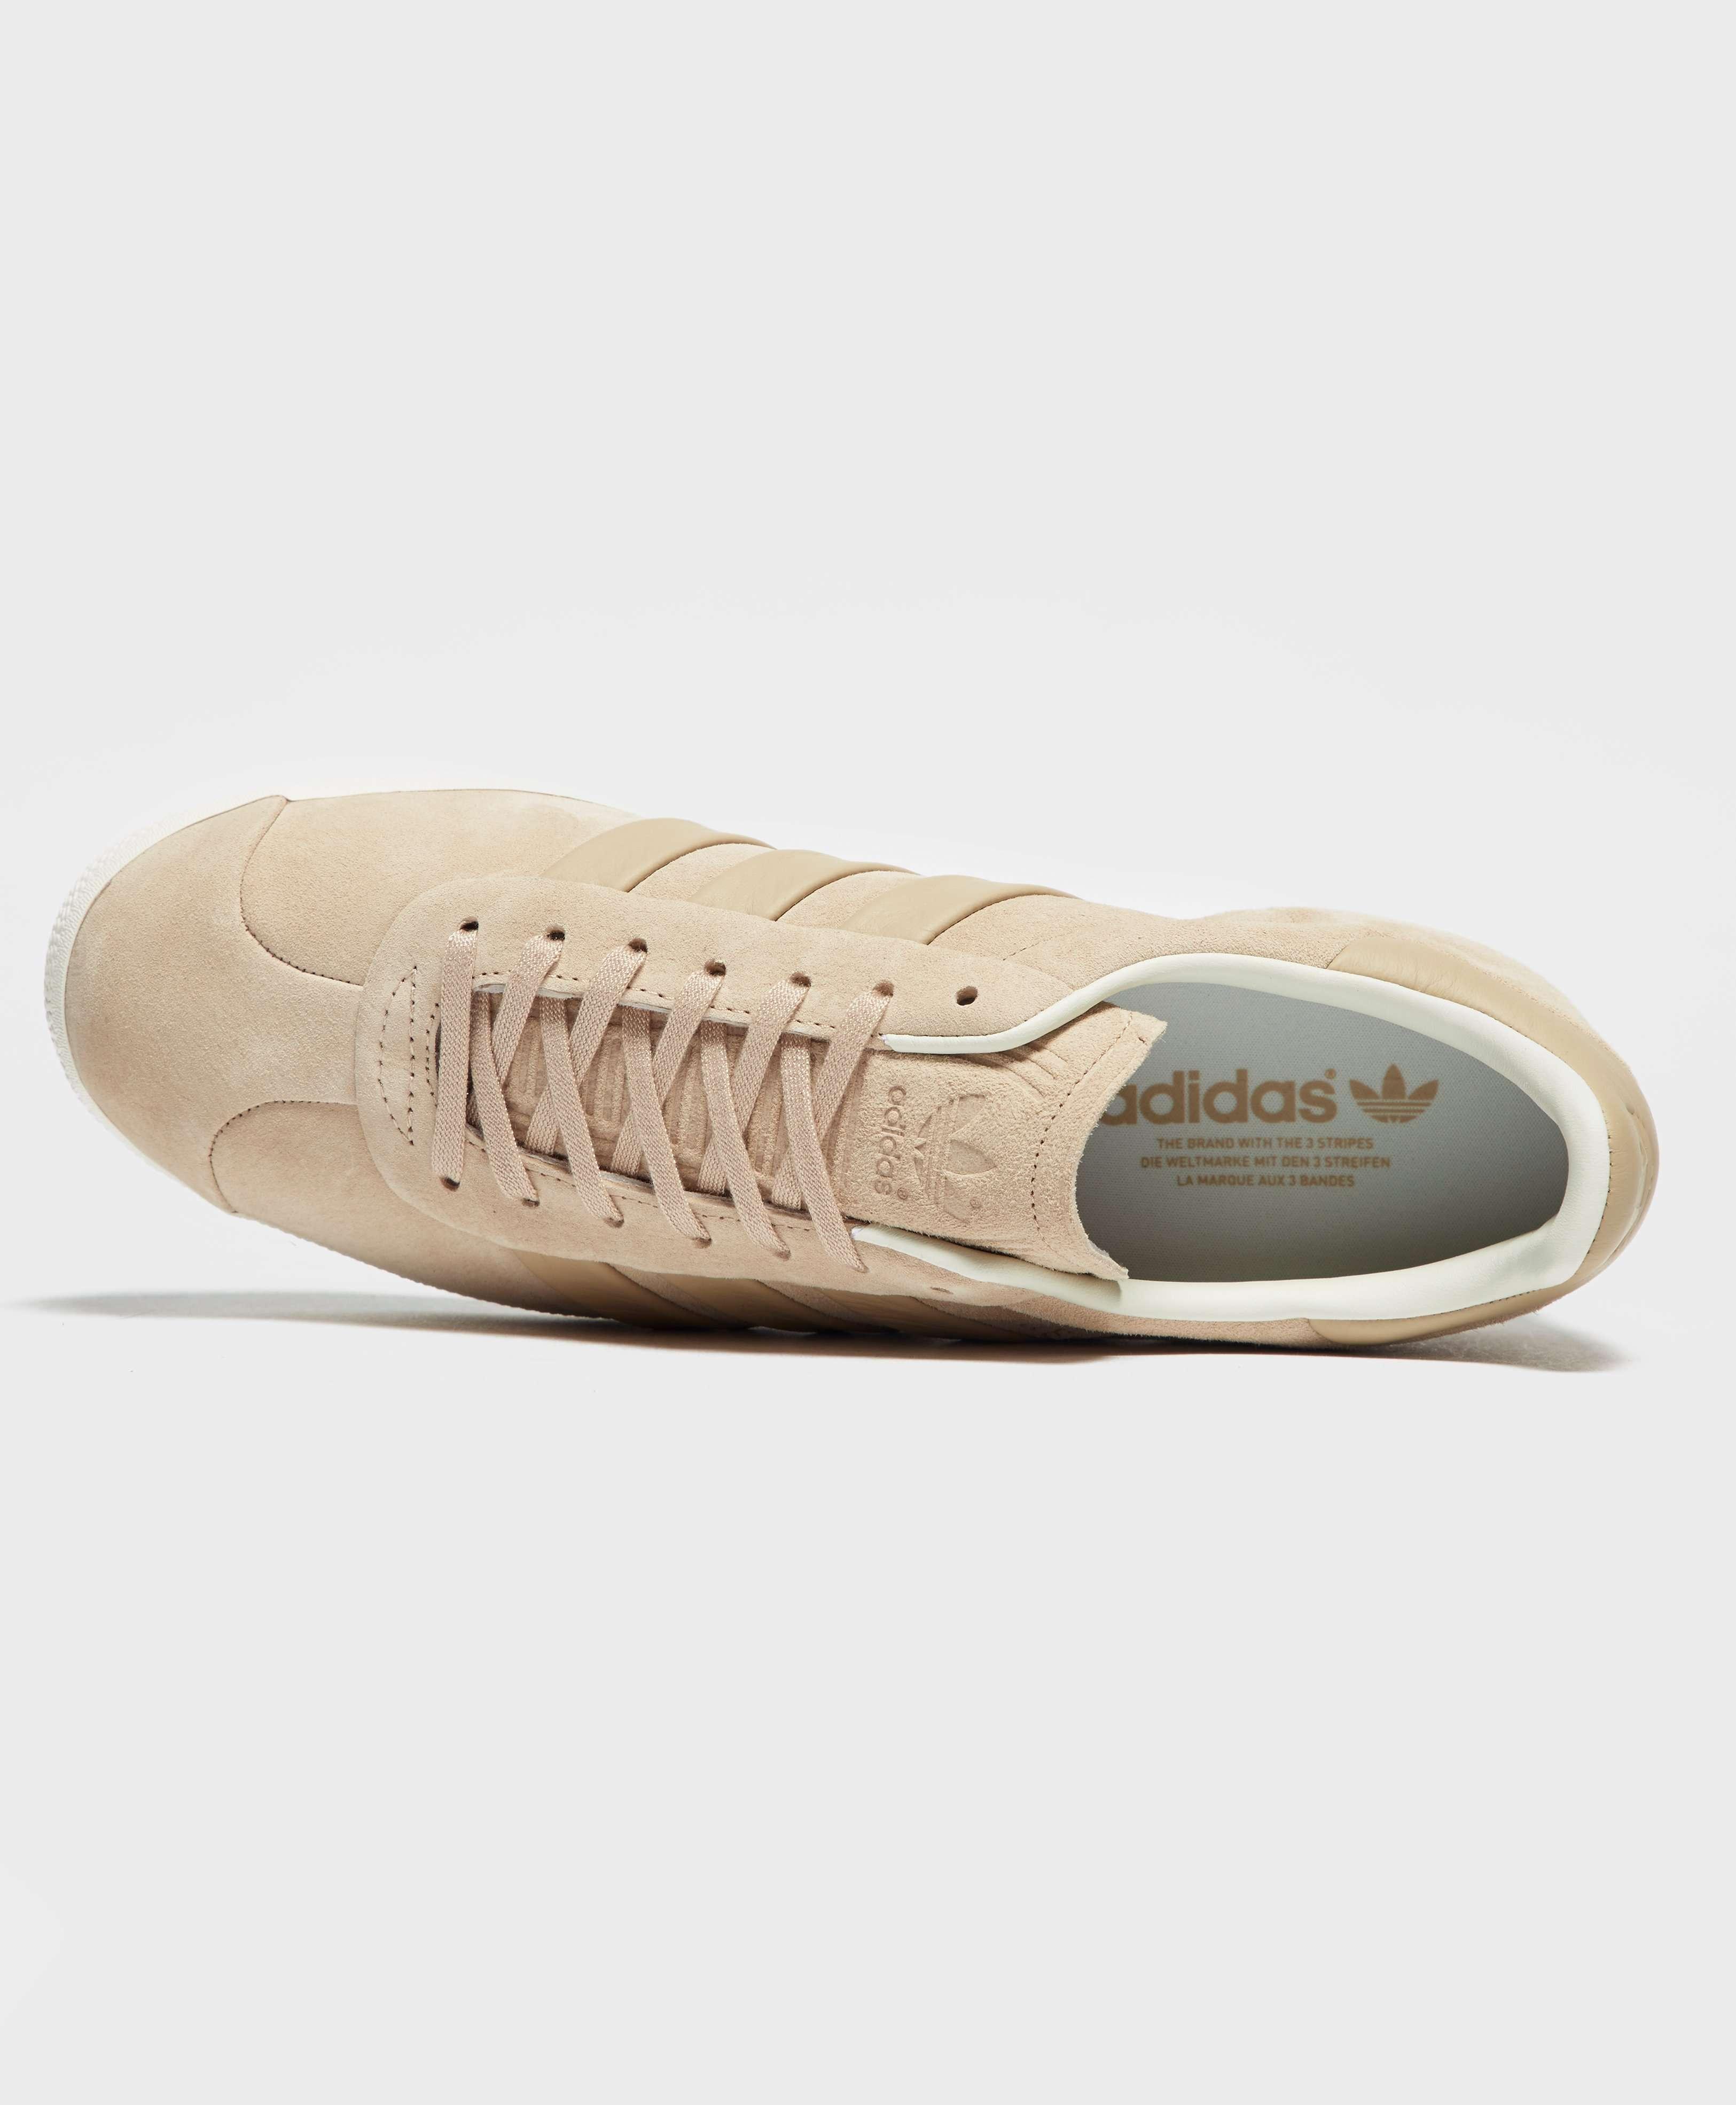 adidas Originals Gazelle Stitch And Turn